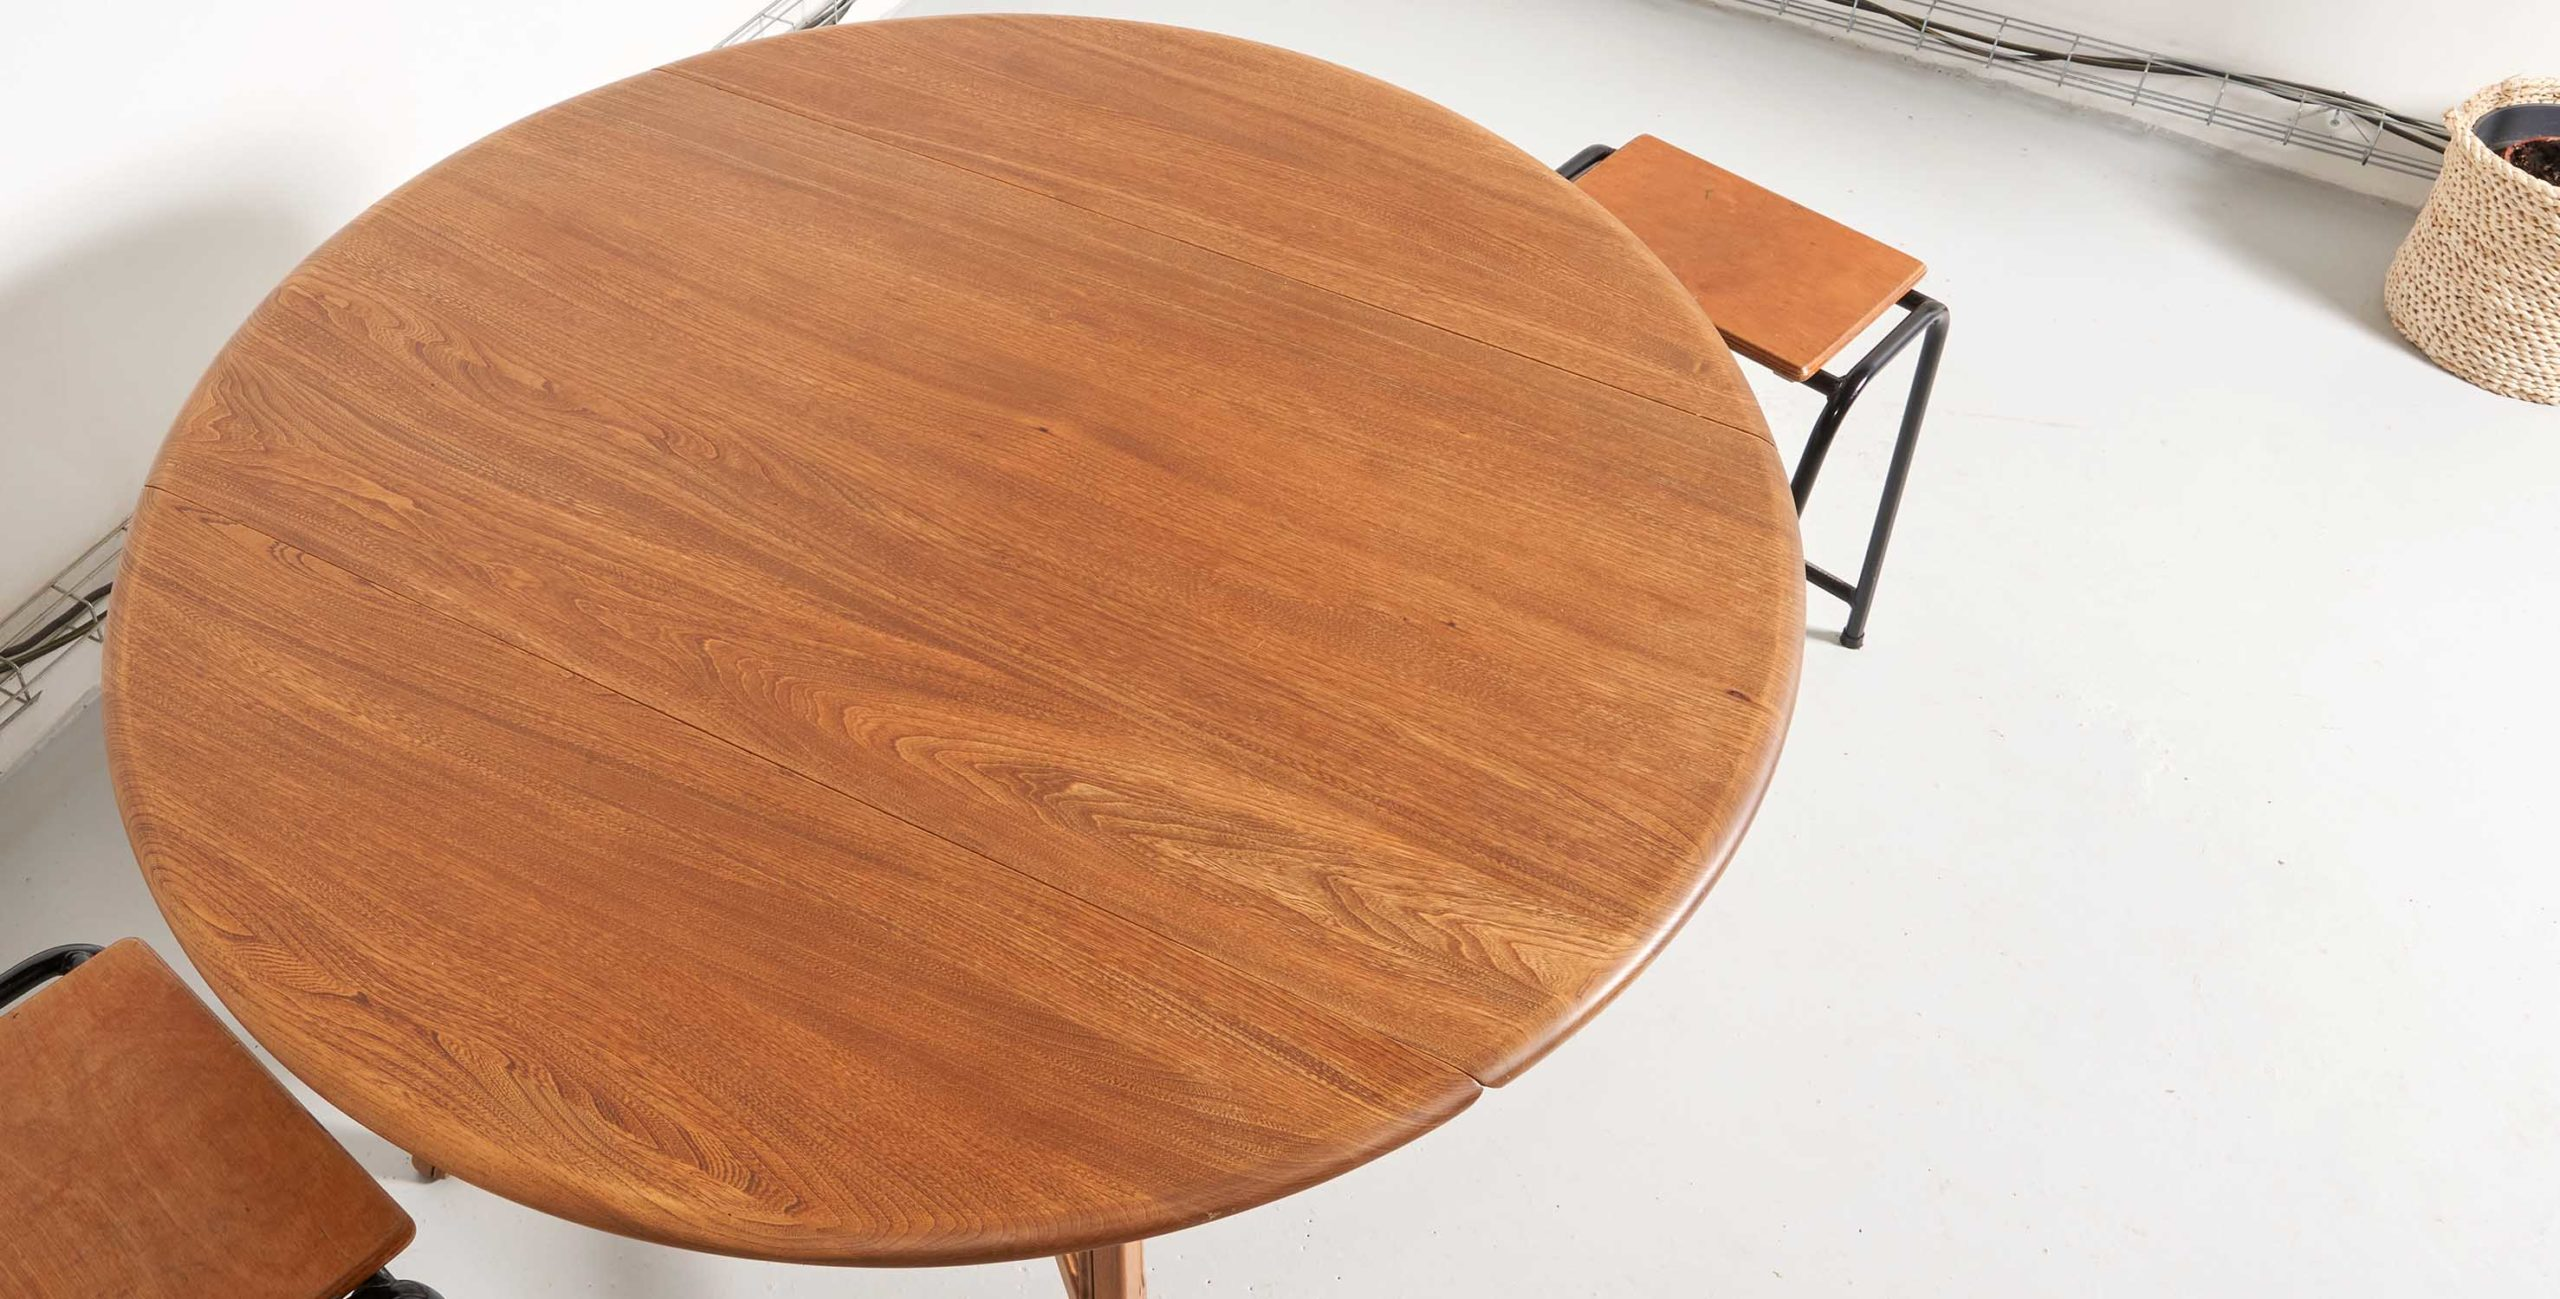 table a manger ercol, table ercol, table ercol vintage, table à. manger ercol vintage, ercol, table ronde vintage, table ovale vintage, table scandinave, table vintage bois blond